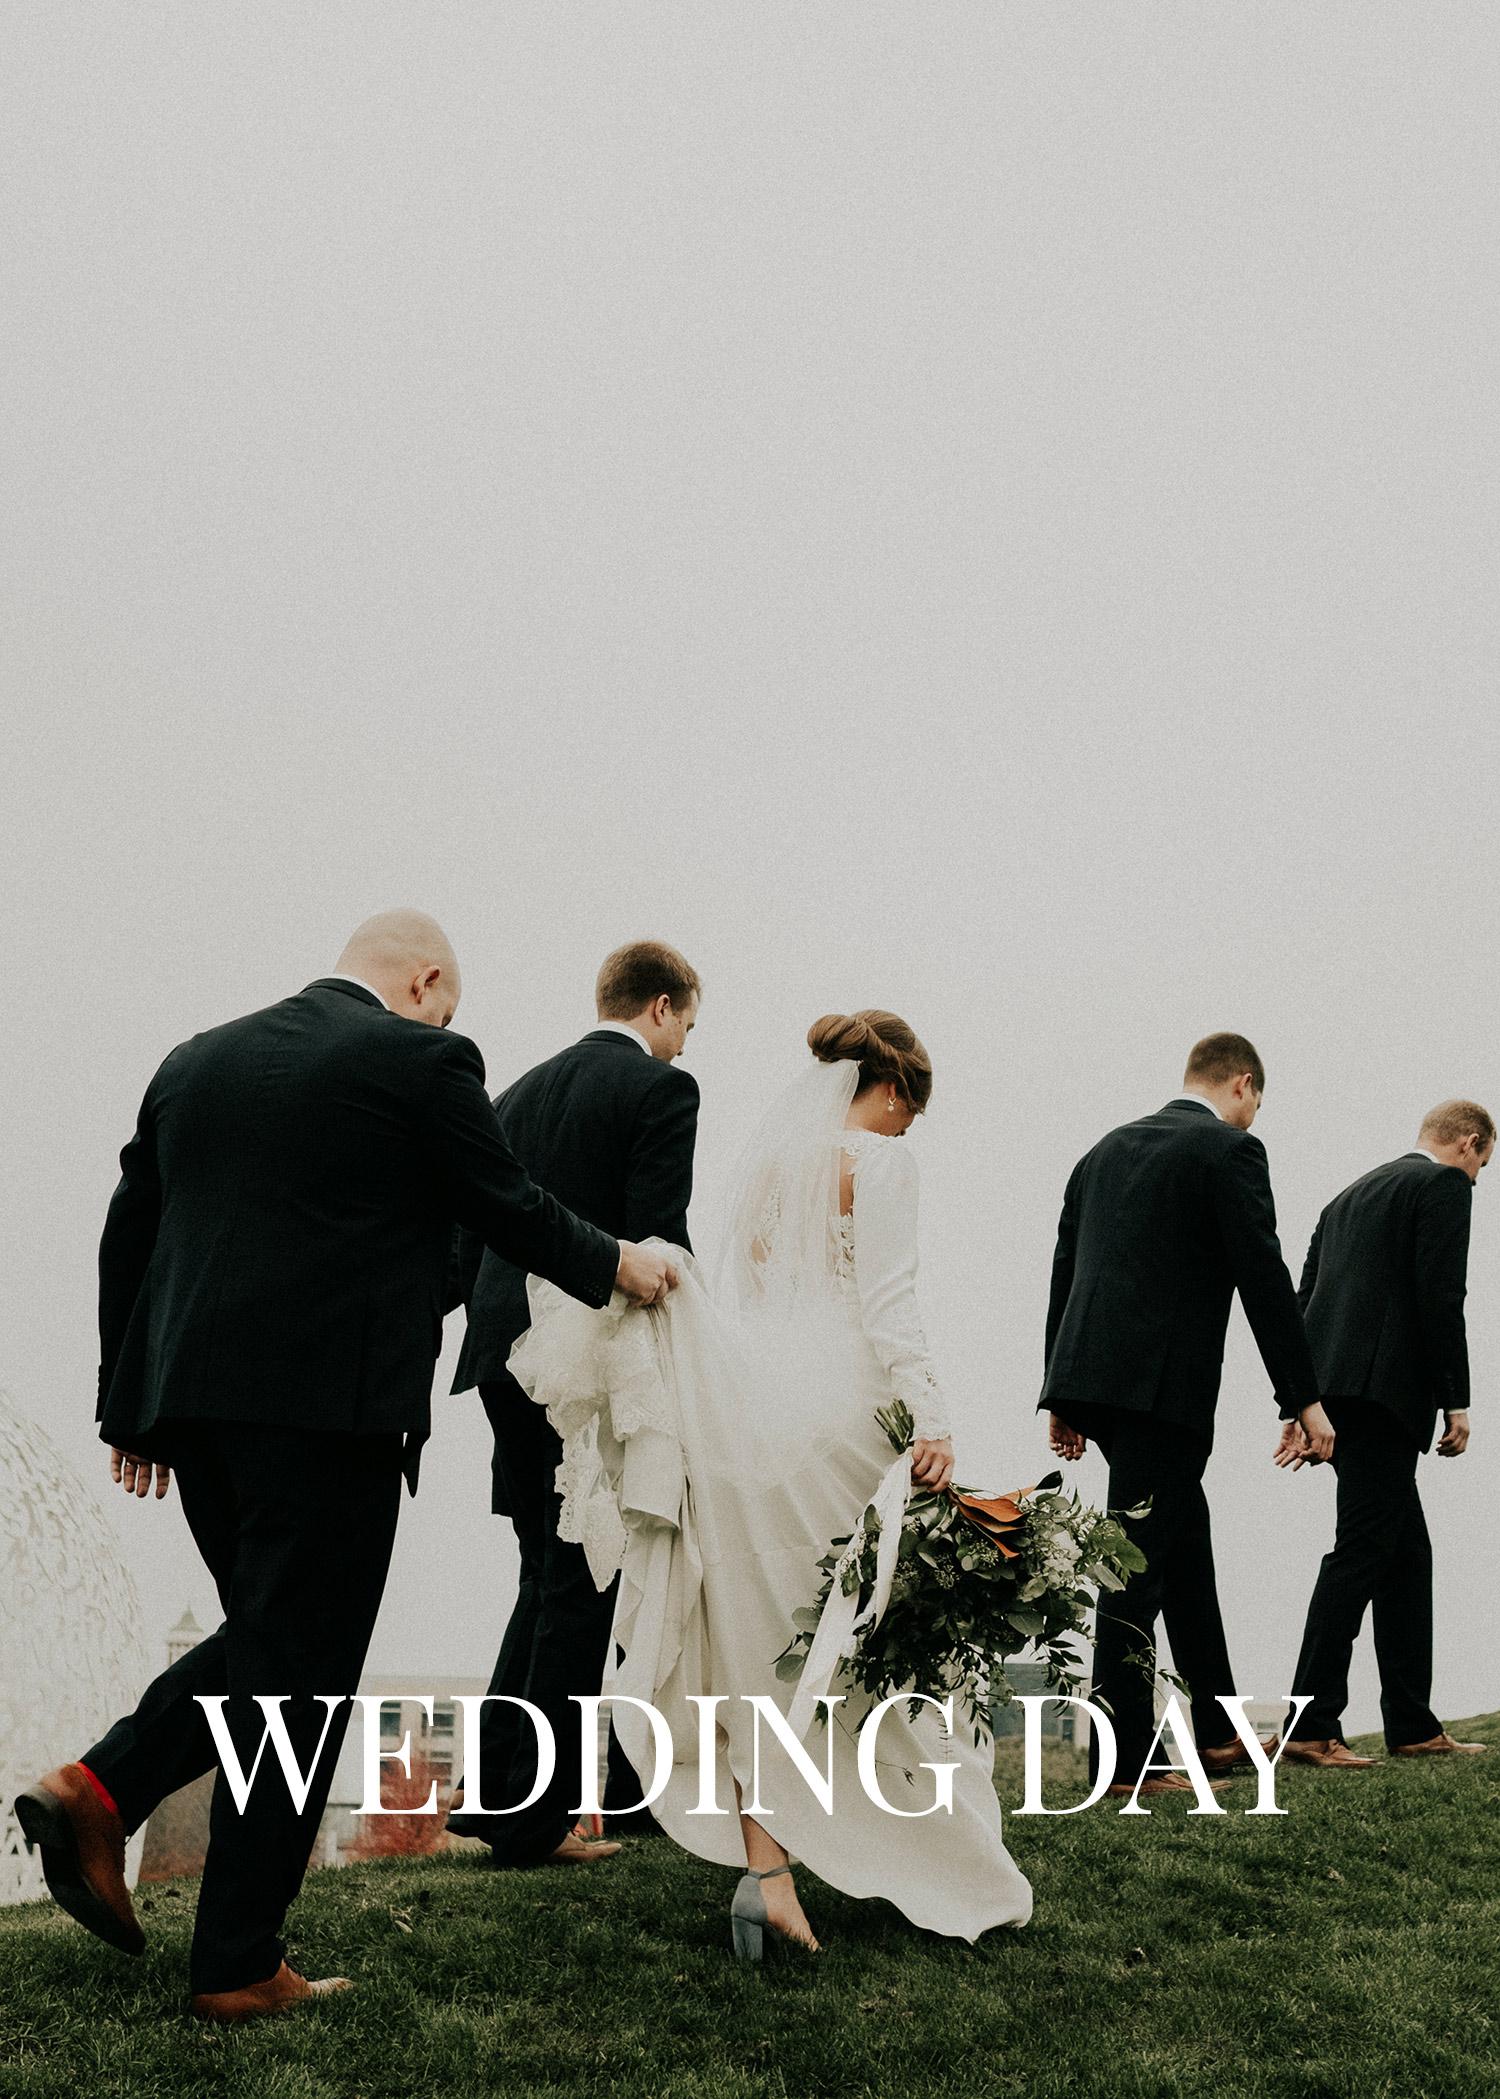 clausen-wedding-bride-groom-walking-raelyn-ramey-photography.jpg